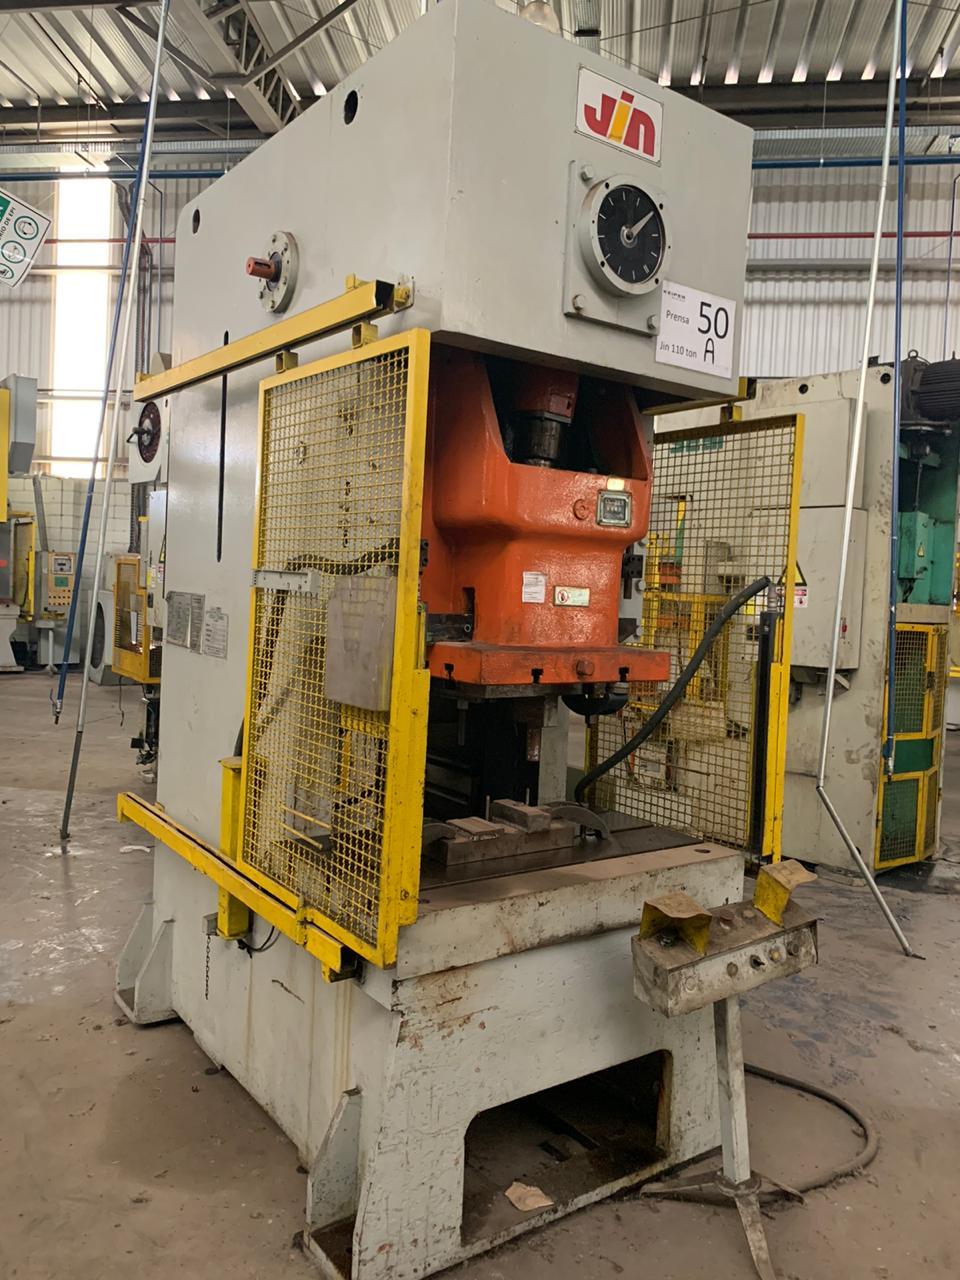 Prensa Excêntrica Jin 110 ton #50A  - AEG Comercial